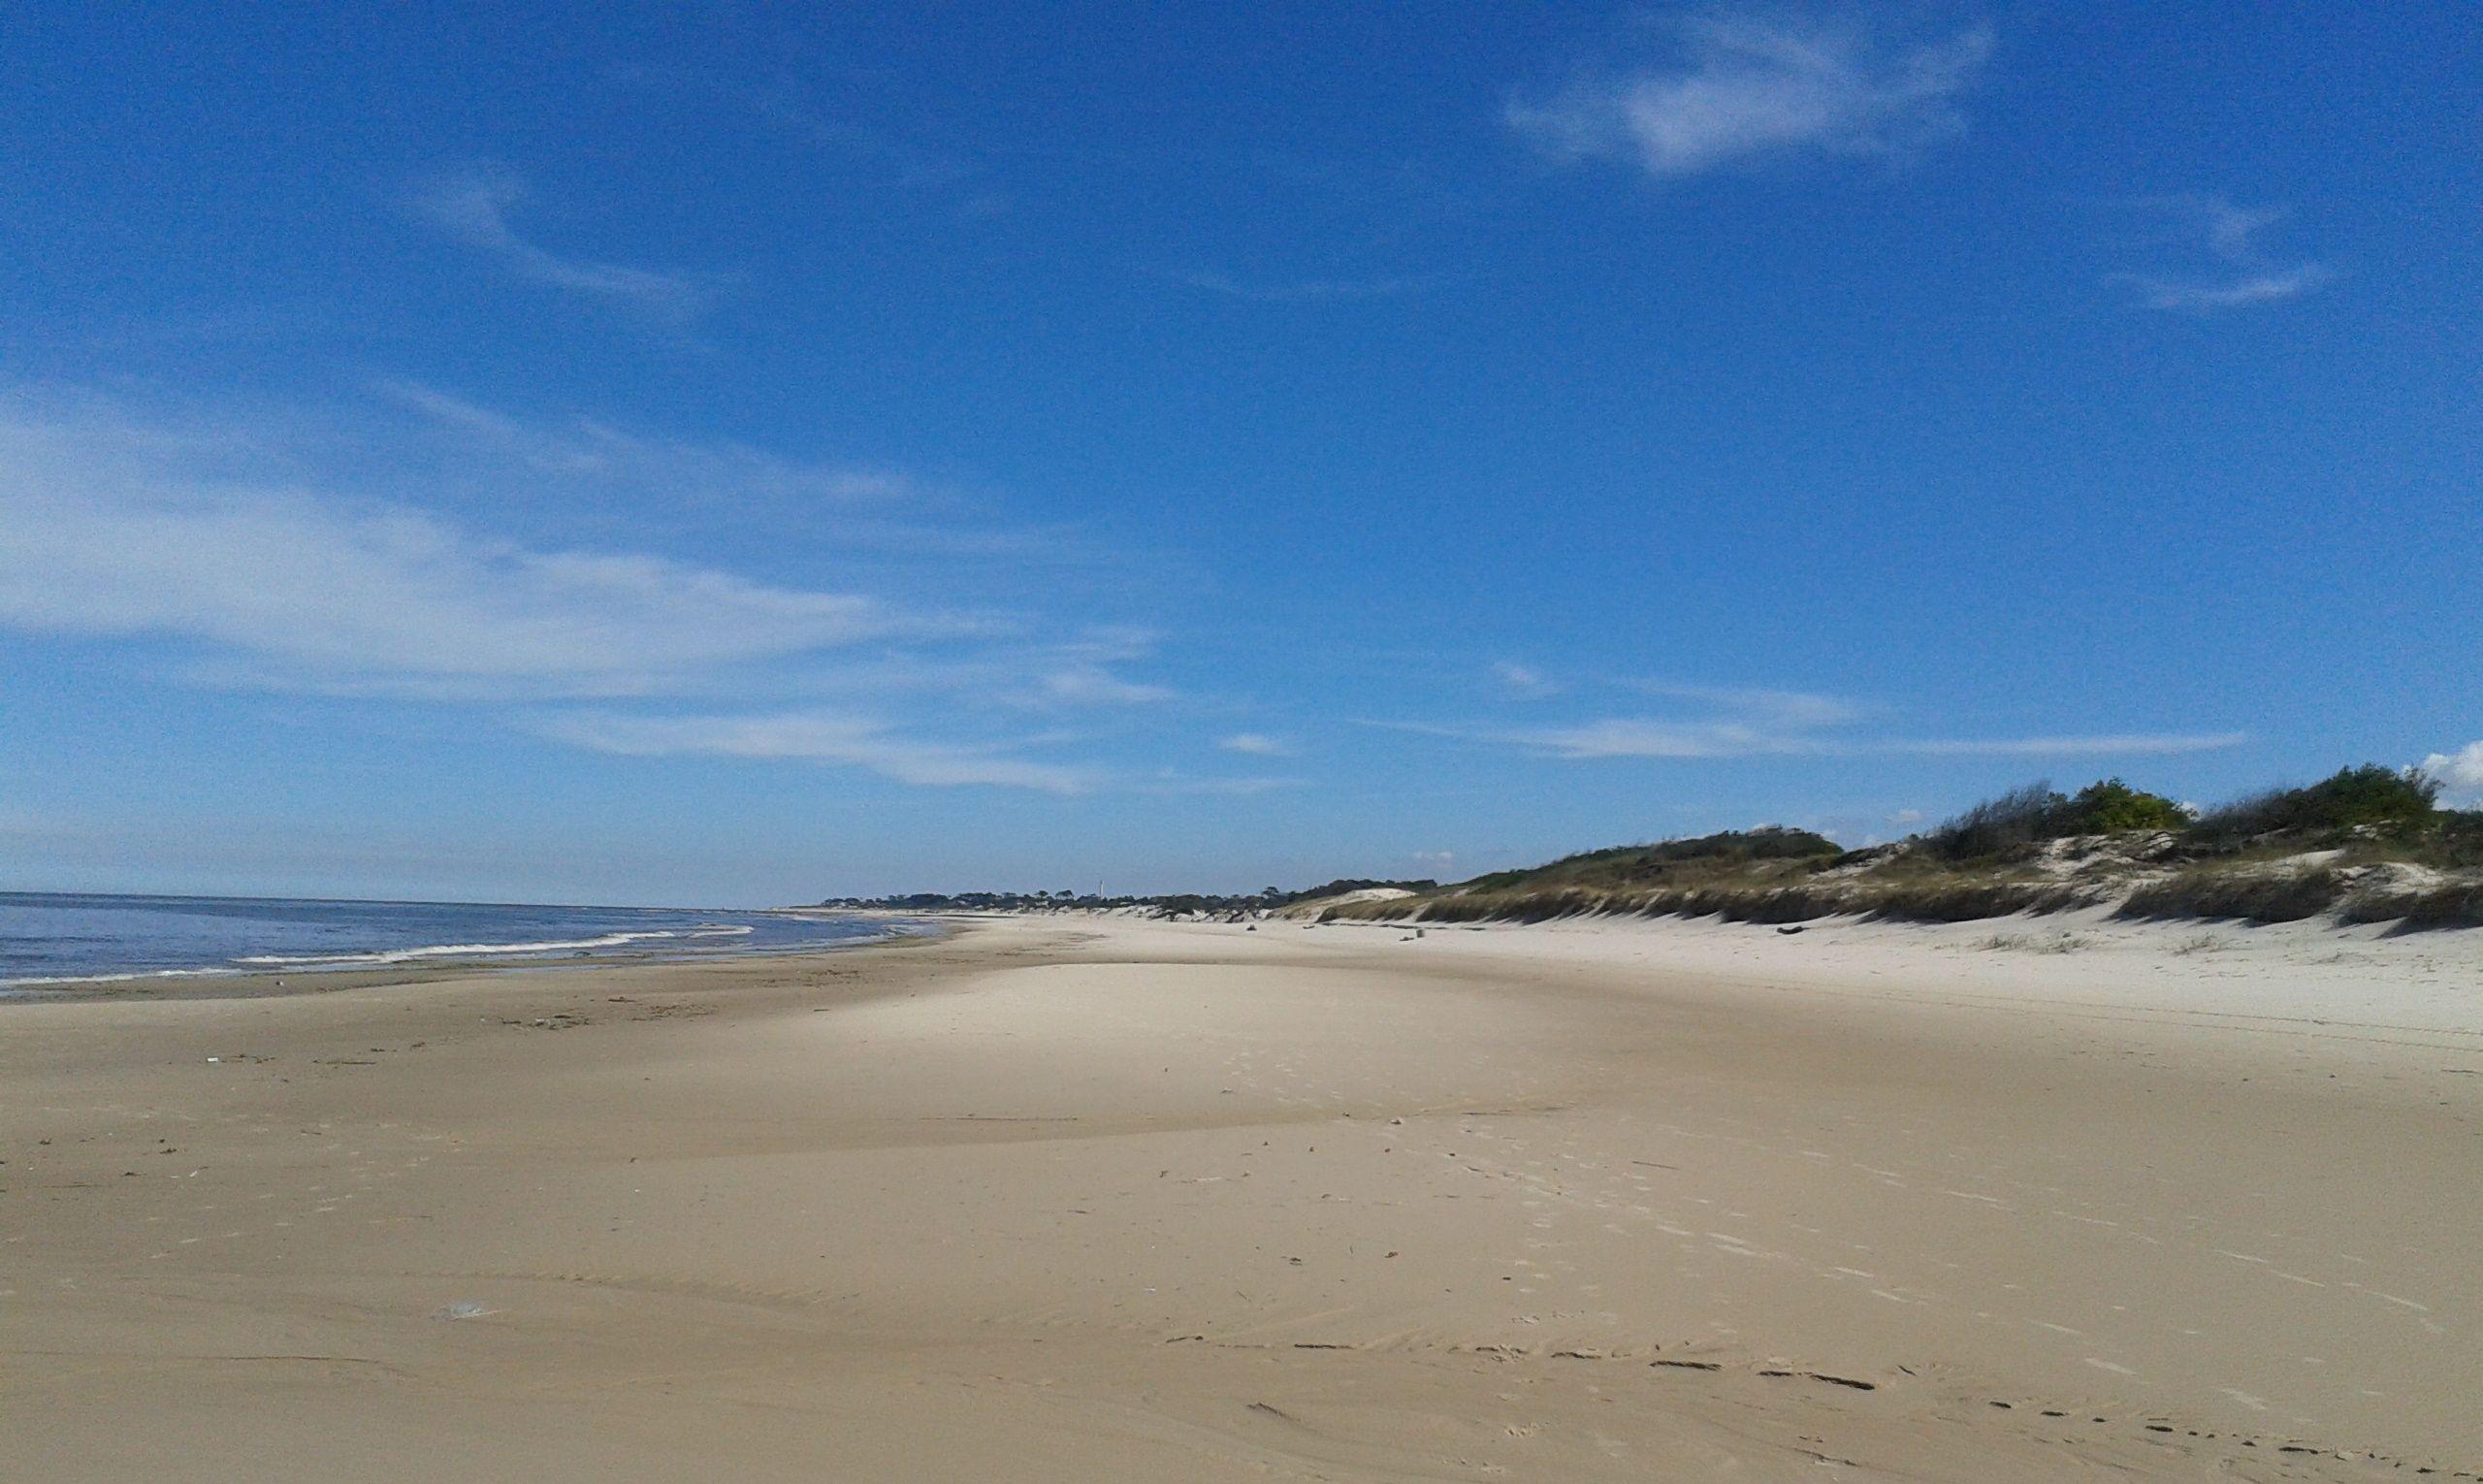 Playa Beach Uruguay Beach Landscape Outdoor